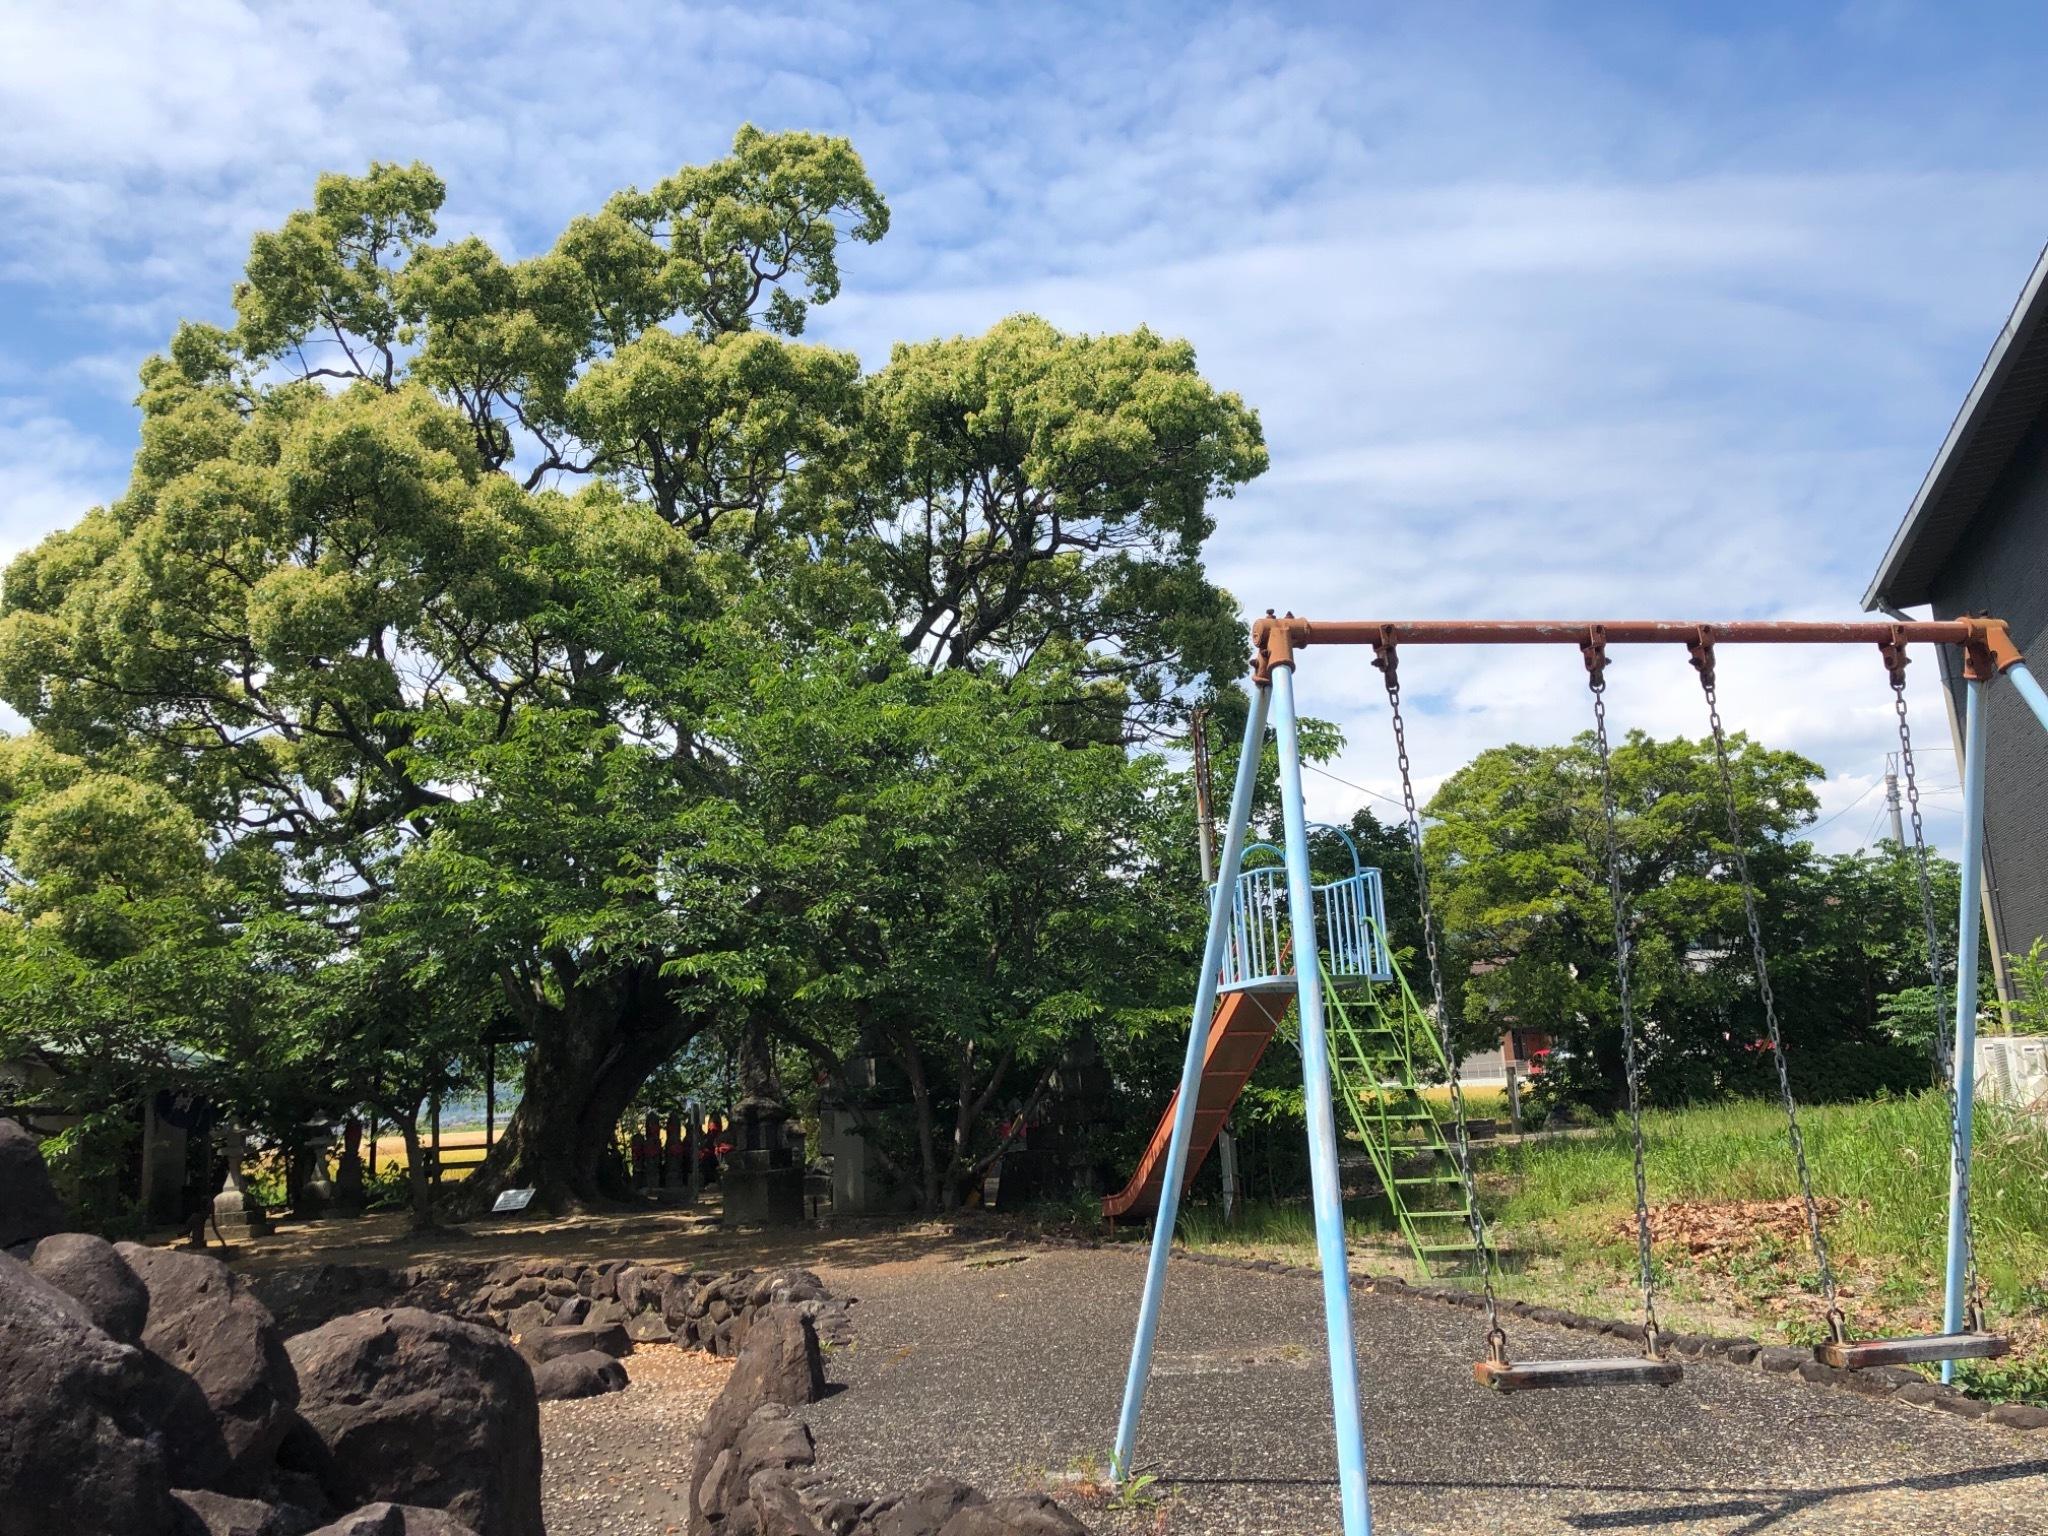 Ushizu Small Castle 5人まで同一料金 ペットと【Vacation STAY提供】 image